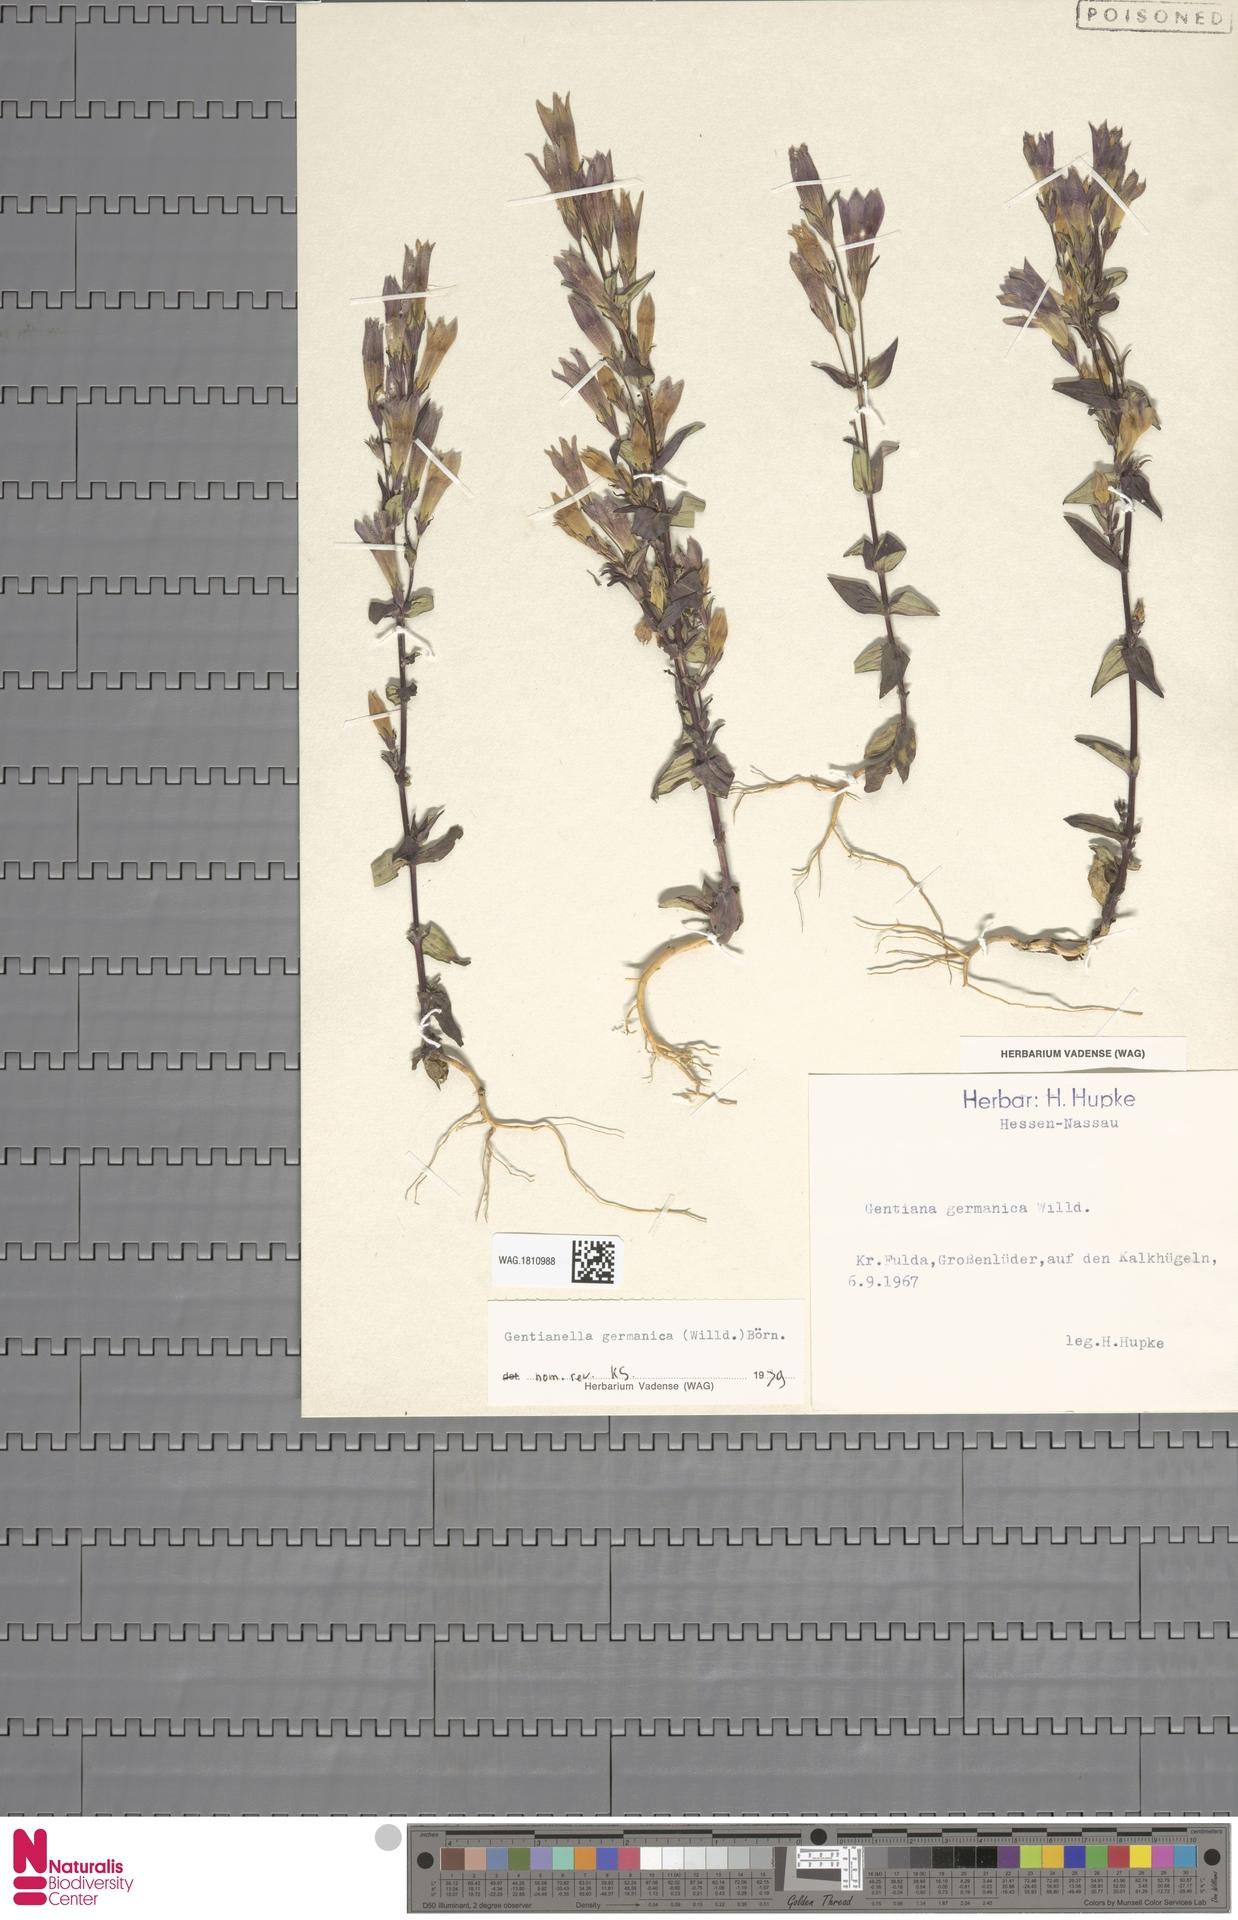 WAG.1810988   Gentianella germanica (Willd.) E.F.Warb.